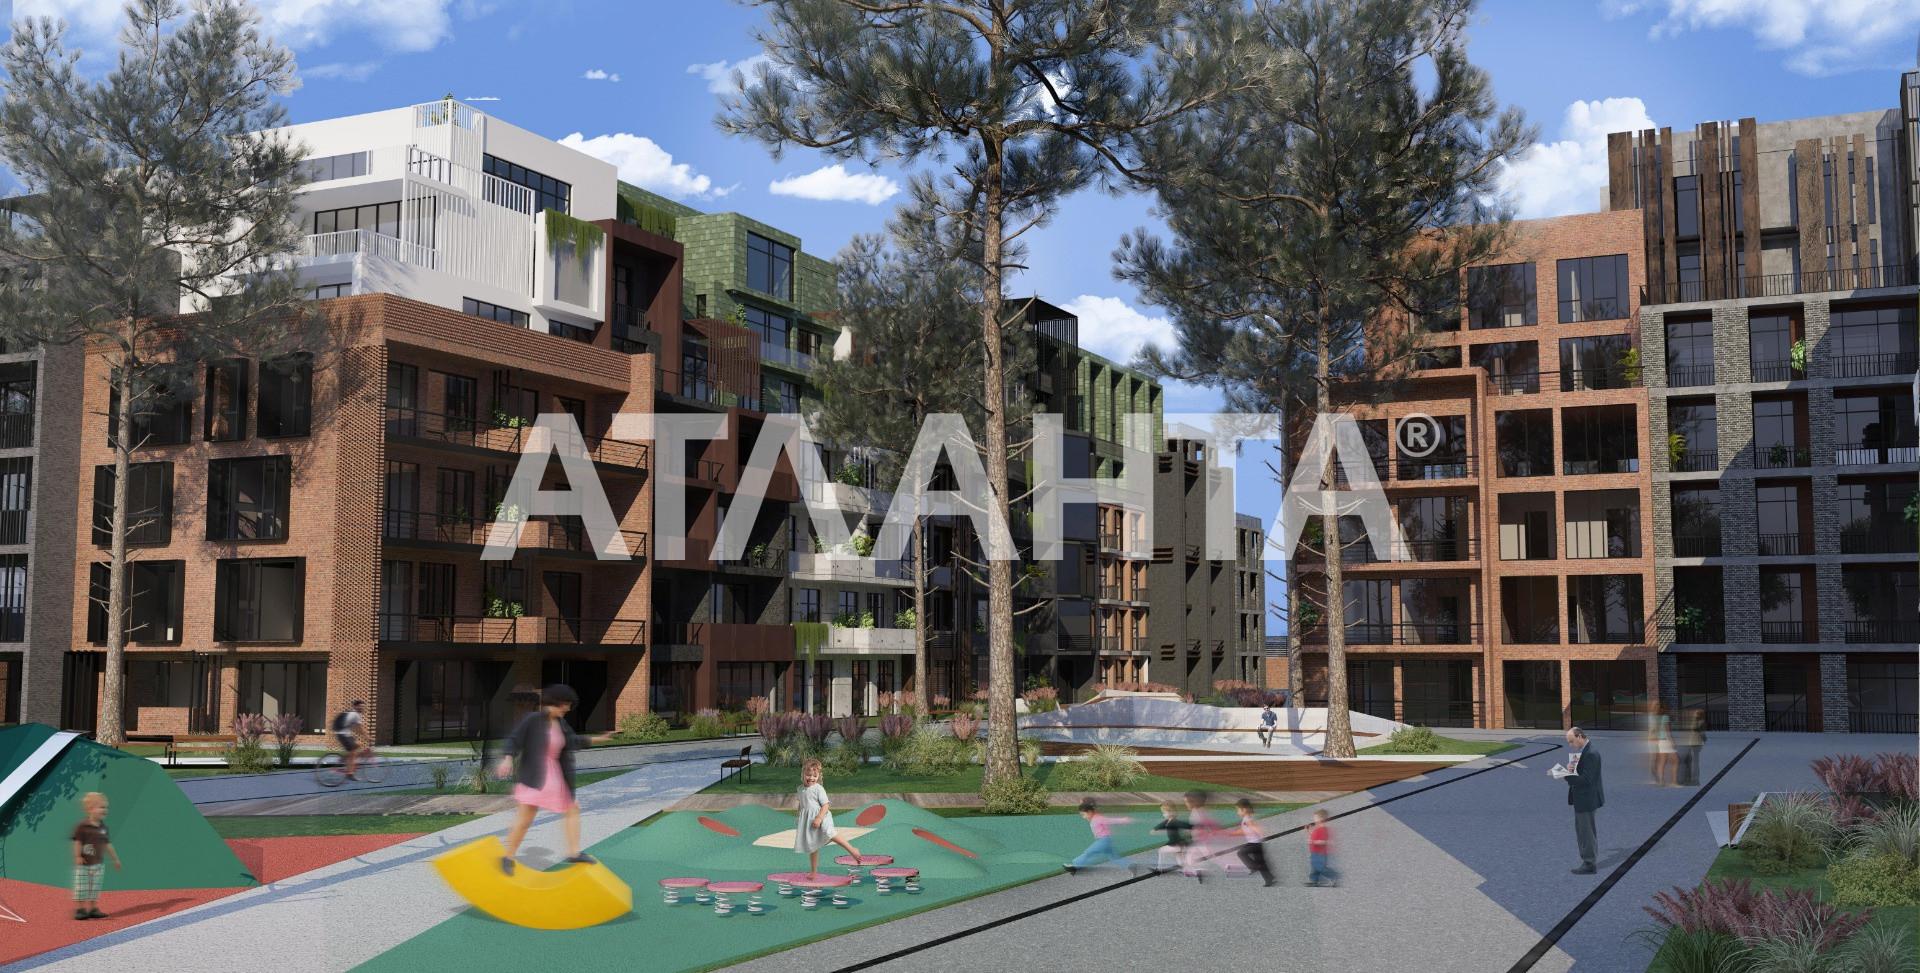 Продается 1-комнатная Квартира на ул. Донского Дмитрия — 39 860 у.е. (фото №2)